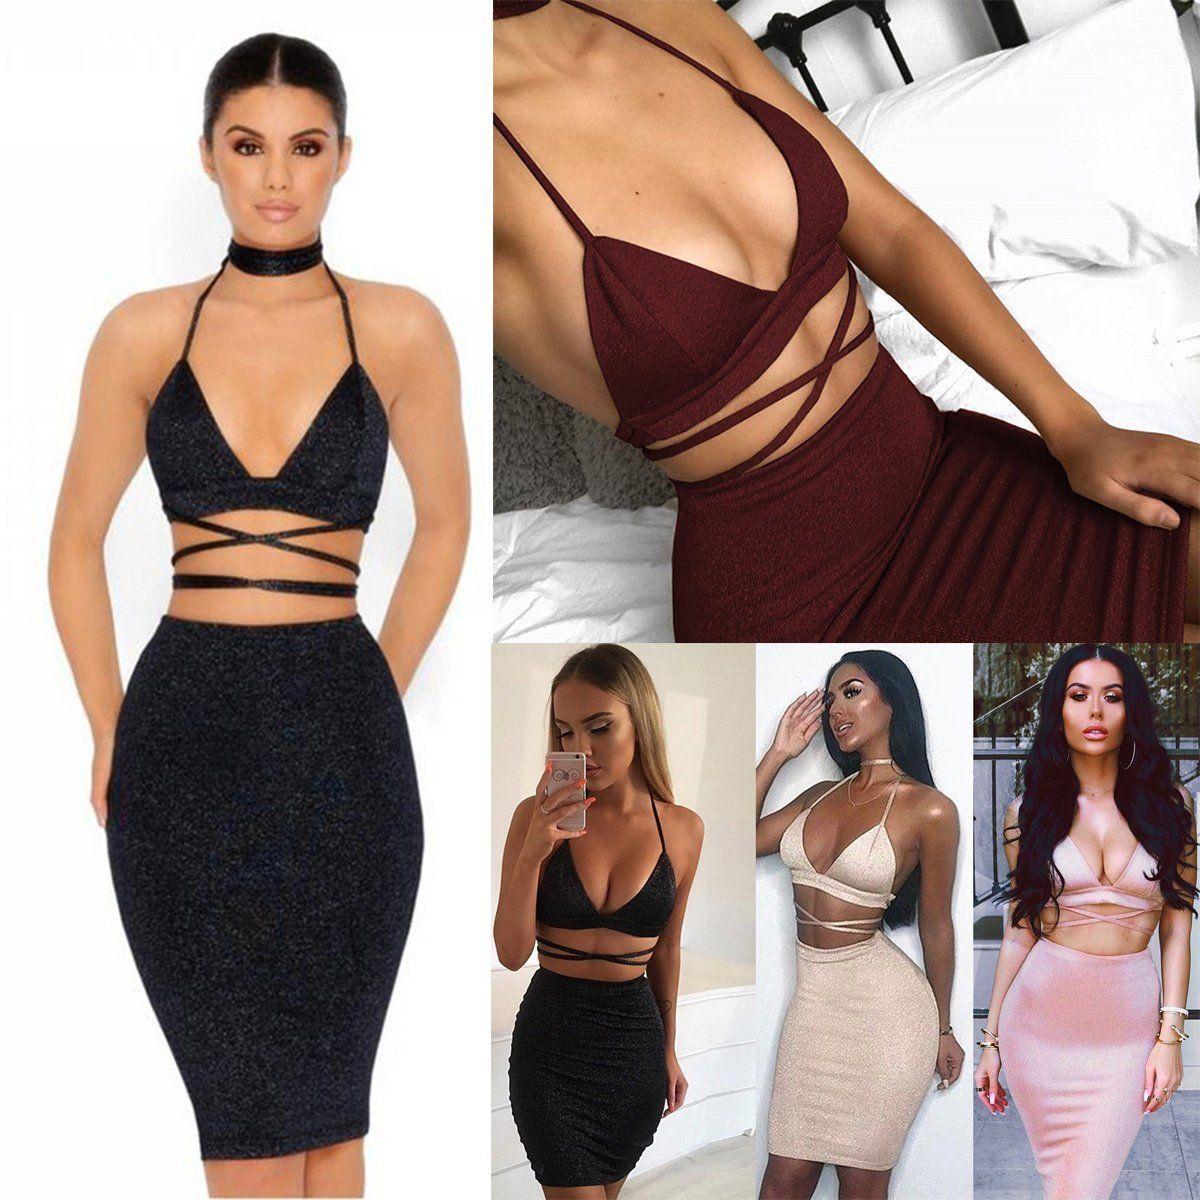 Women 2 Piece Set Dresses Bodycon Skirt Outfit Crop Top Mini Summer Dress Bandge Mini Dresses Summer Hot Outfits Bodycon Skirt Outfit [ 1200 x 1200 Pixel ]